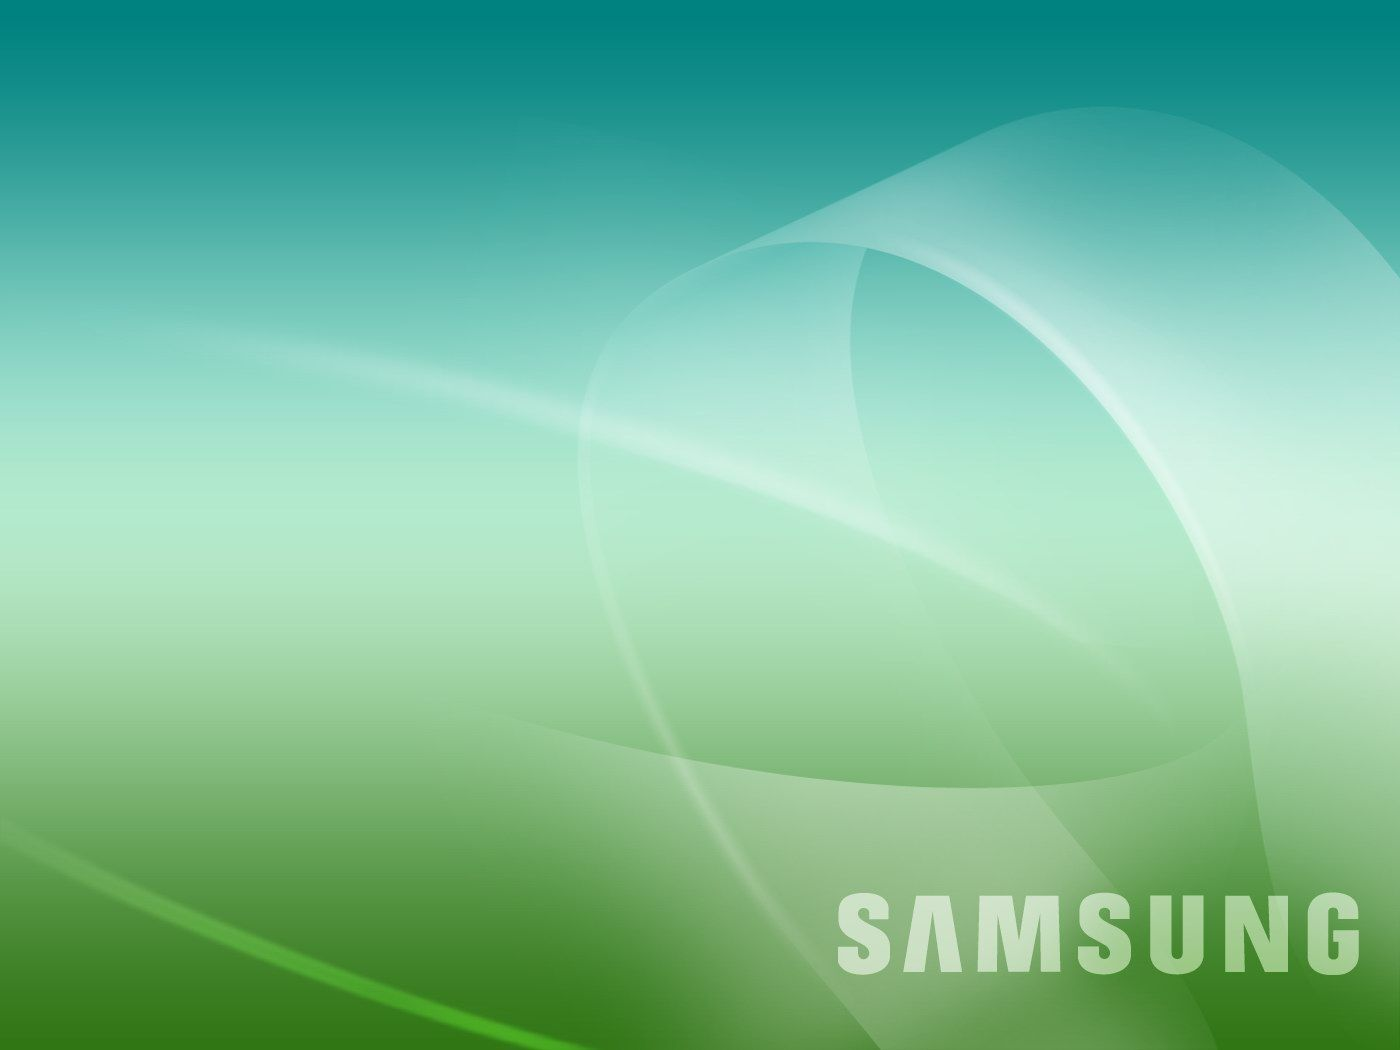 Samsung Mobile Wallpapers: Samsung Mobile Wallpapers Free Mobile Wallpapers Free